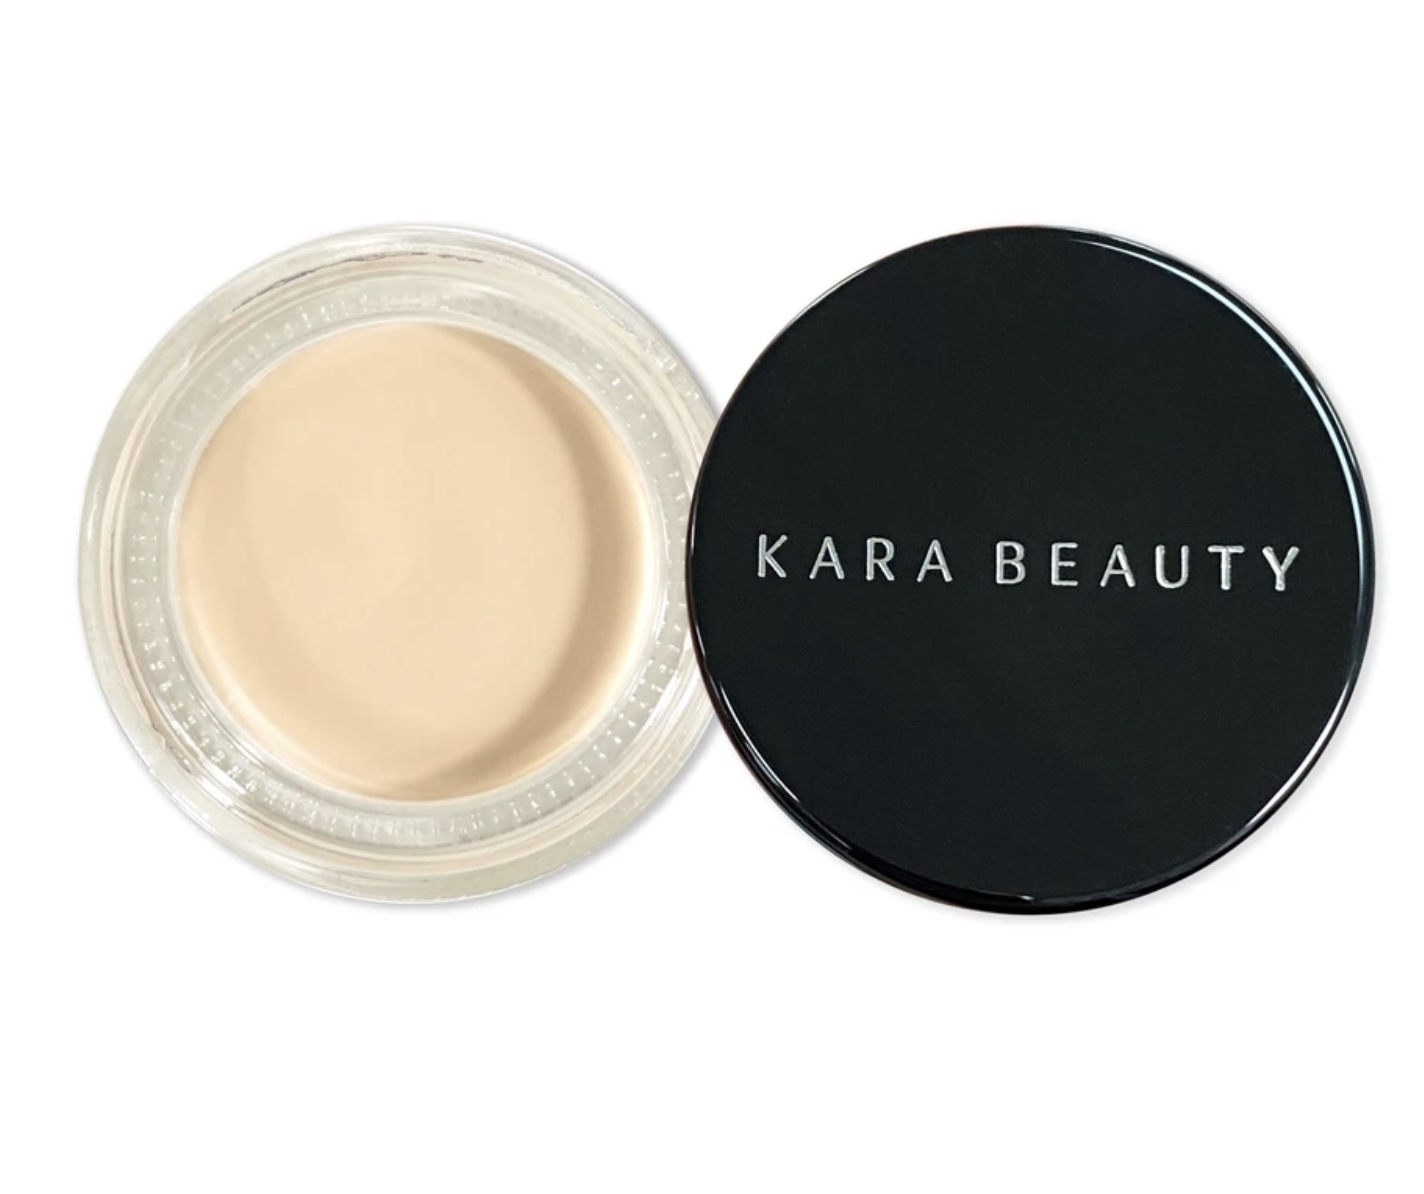 Kara Beauty NUDE Eye Primer